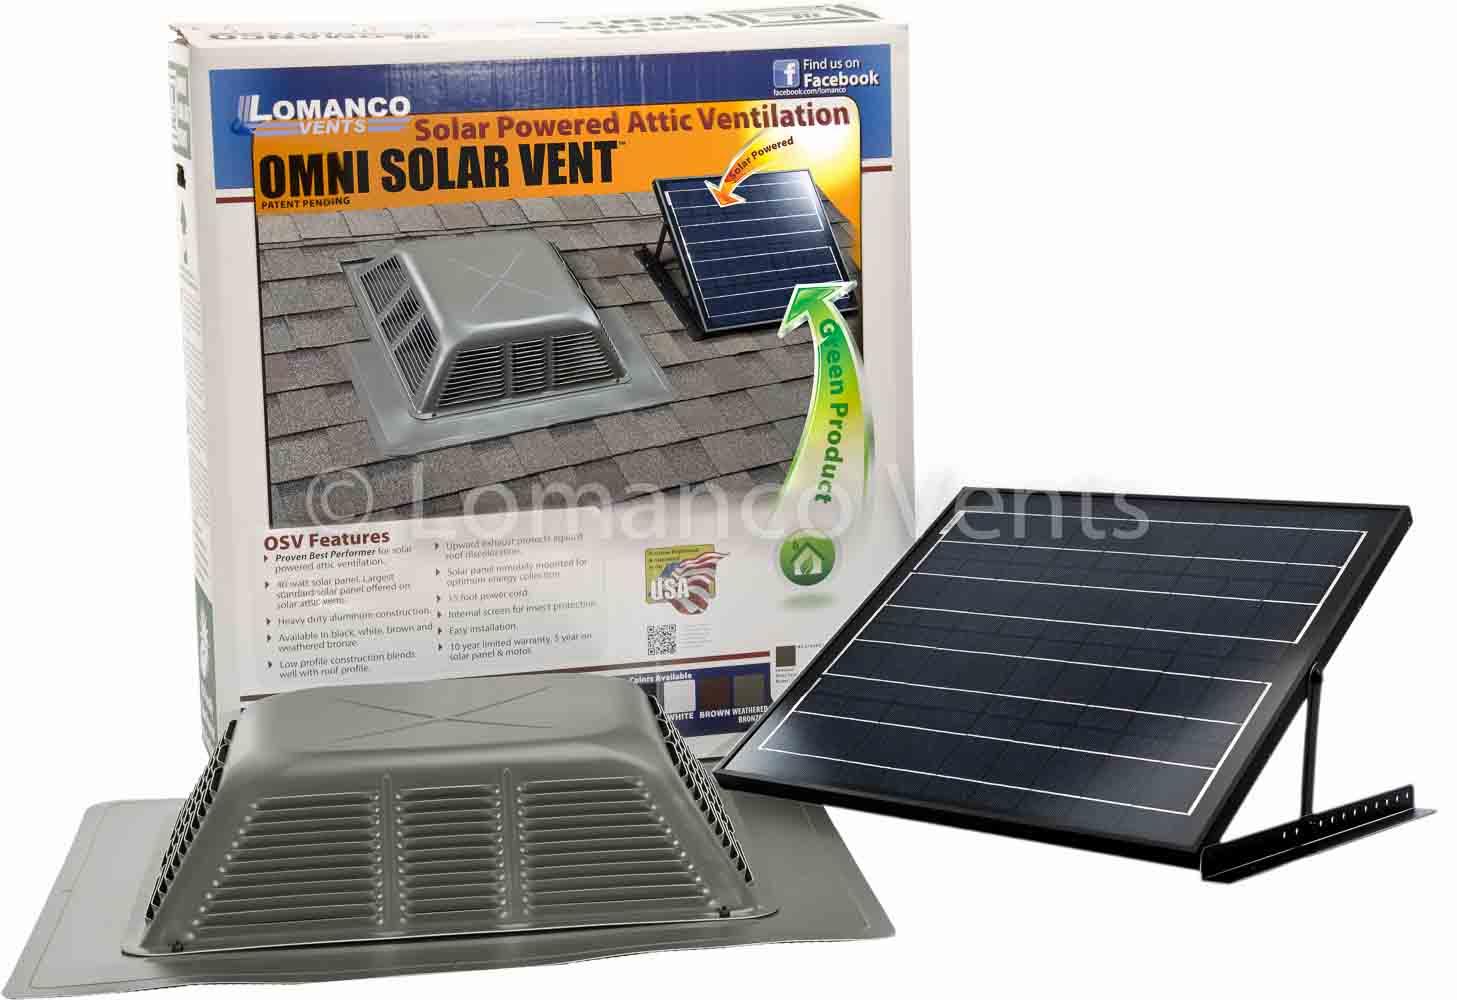 Lomanco Vents Solar Power Vents